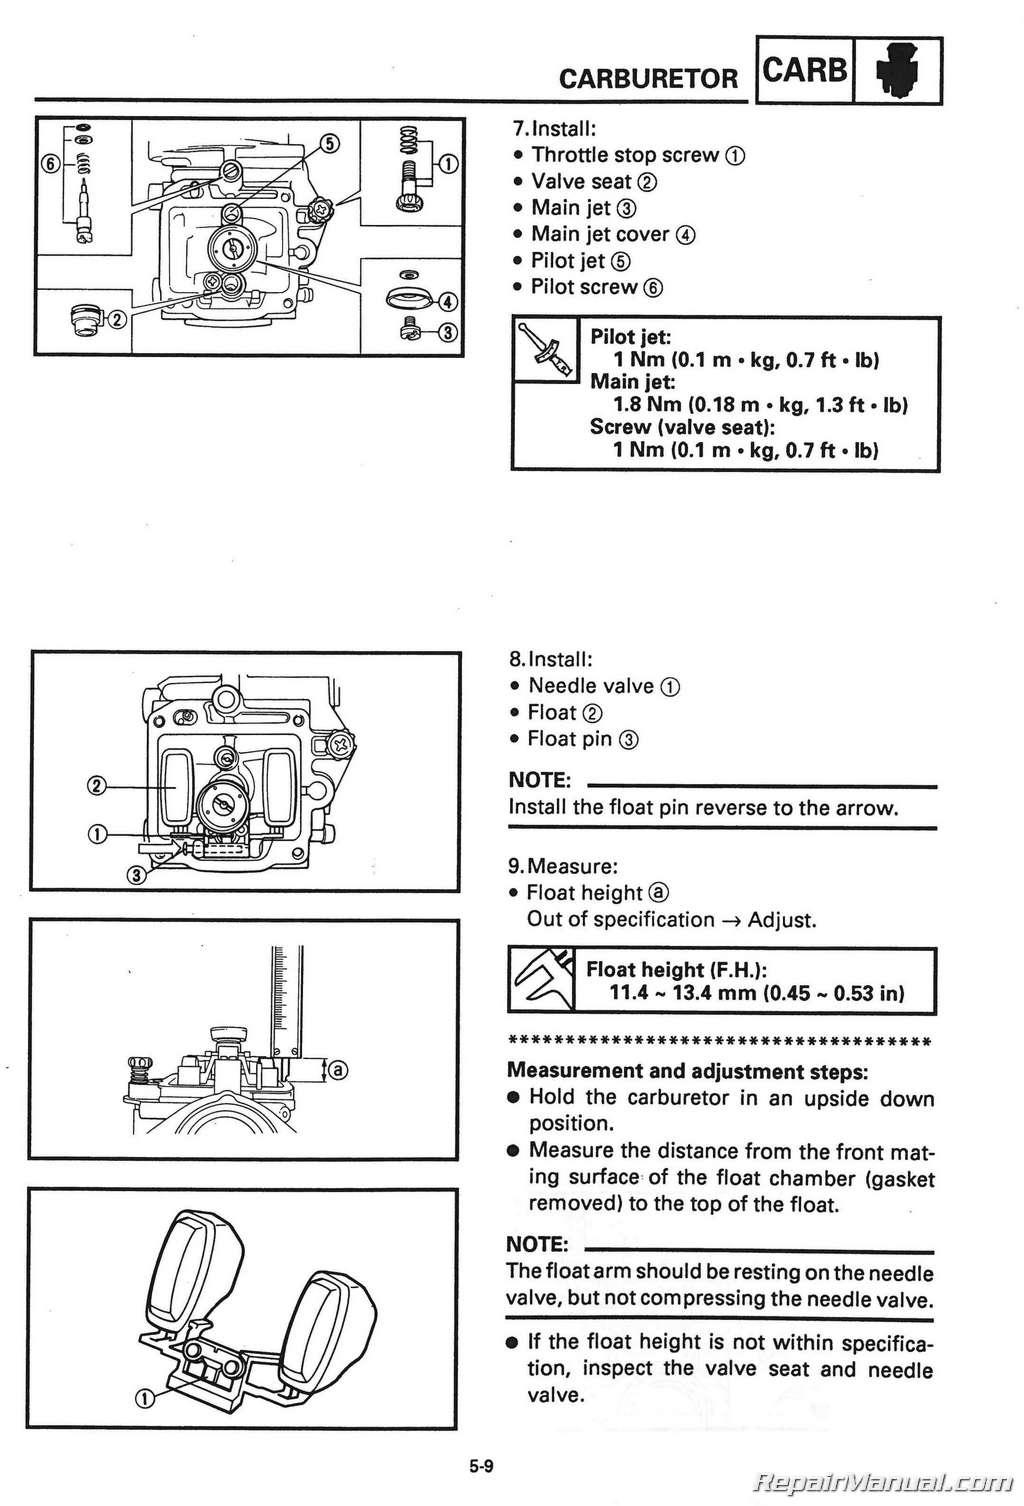 1999 Yamaha Big Bear 350 Wiring Diagram - Roslonek.net